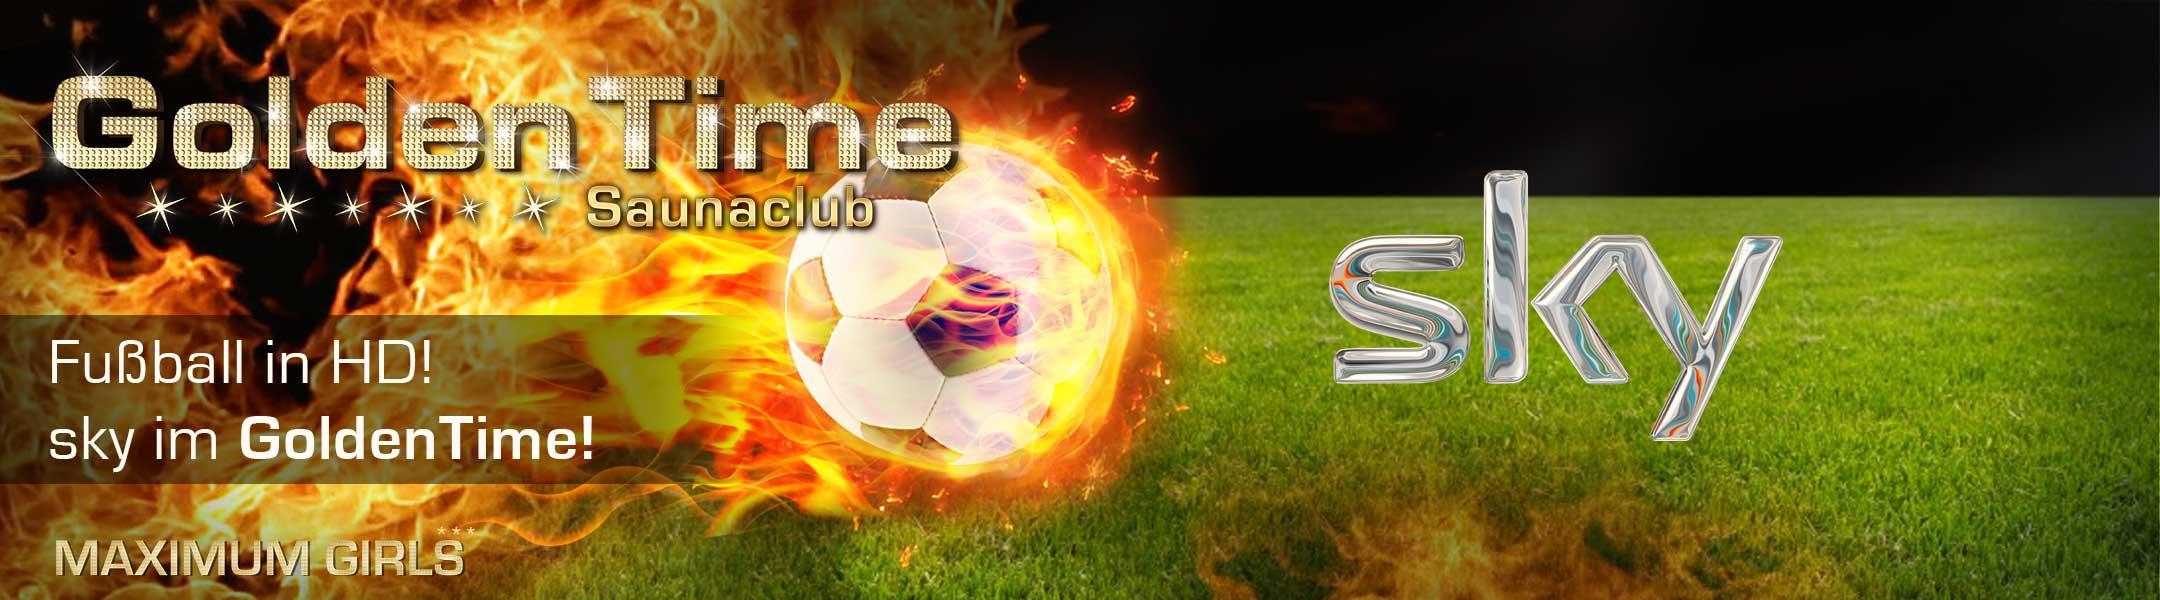 Fussball in HD! sky im GoldenTime!